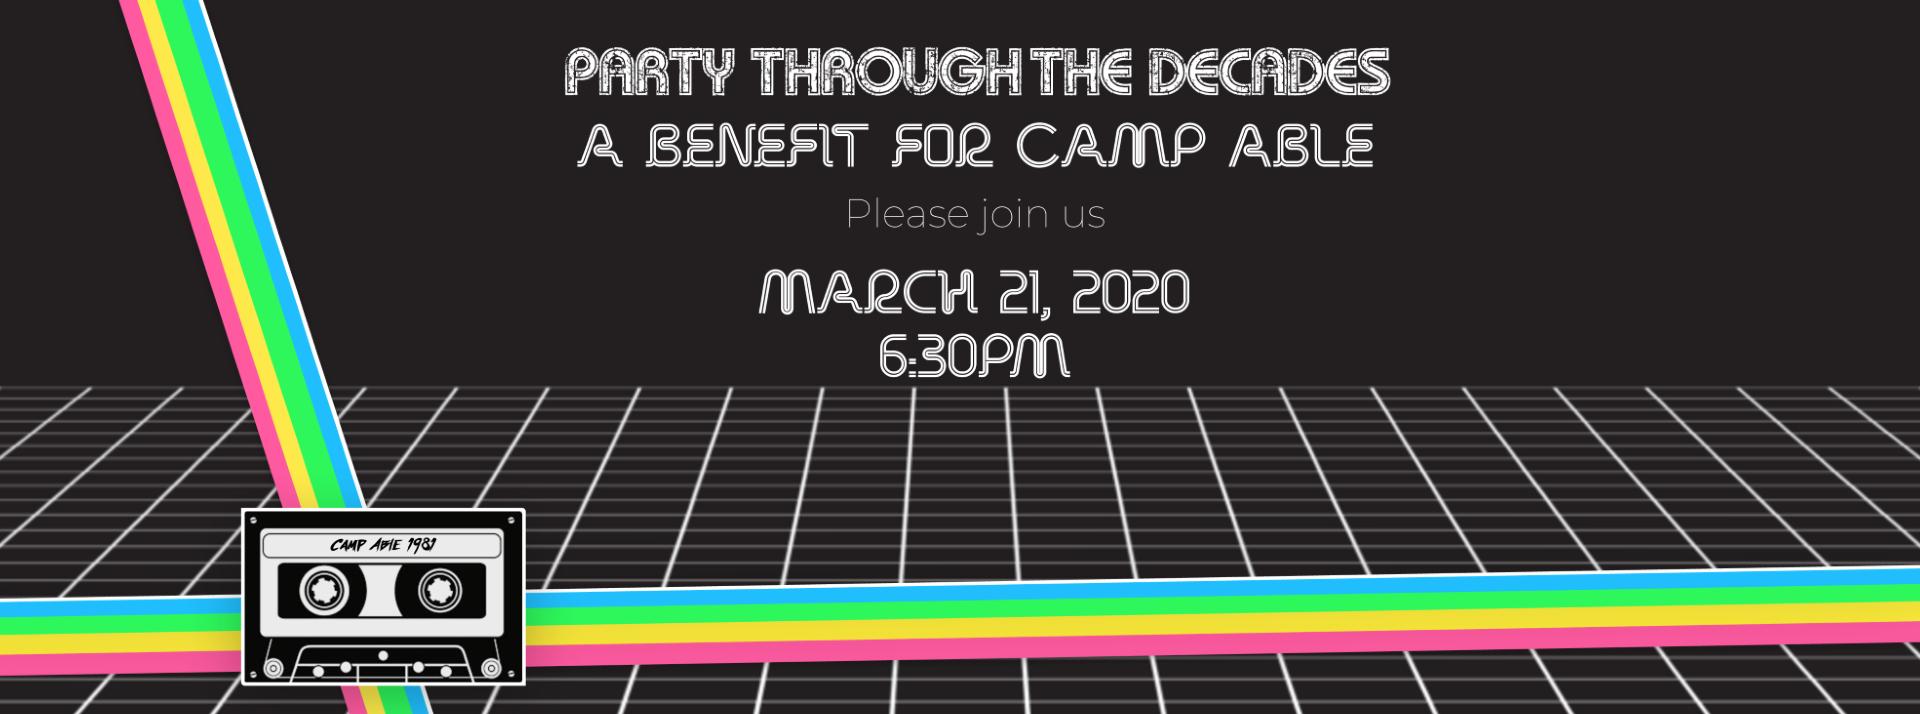 2020 Benefit